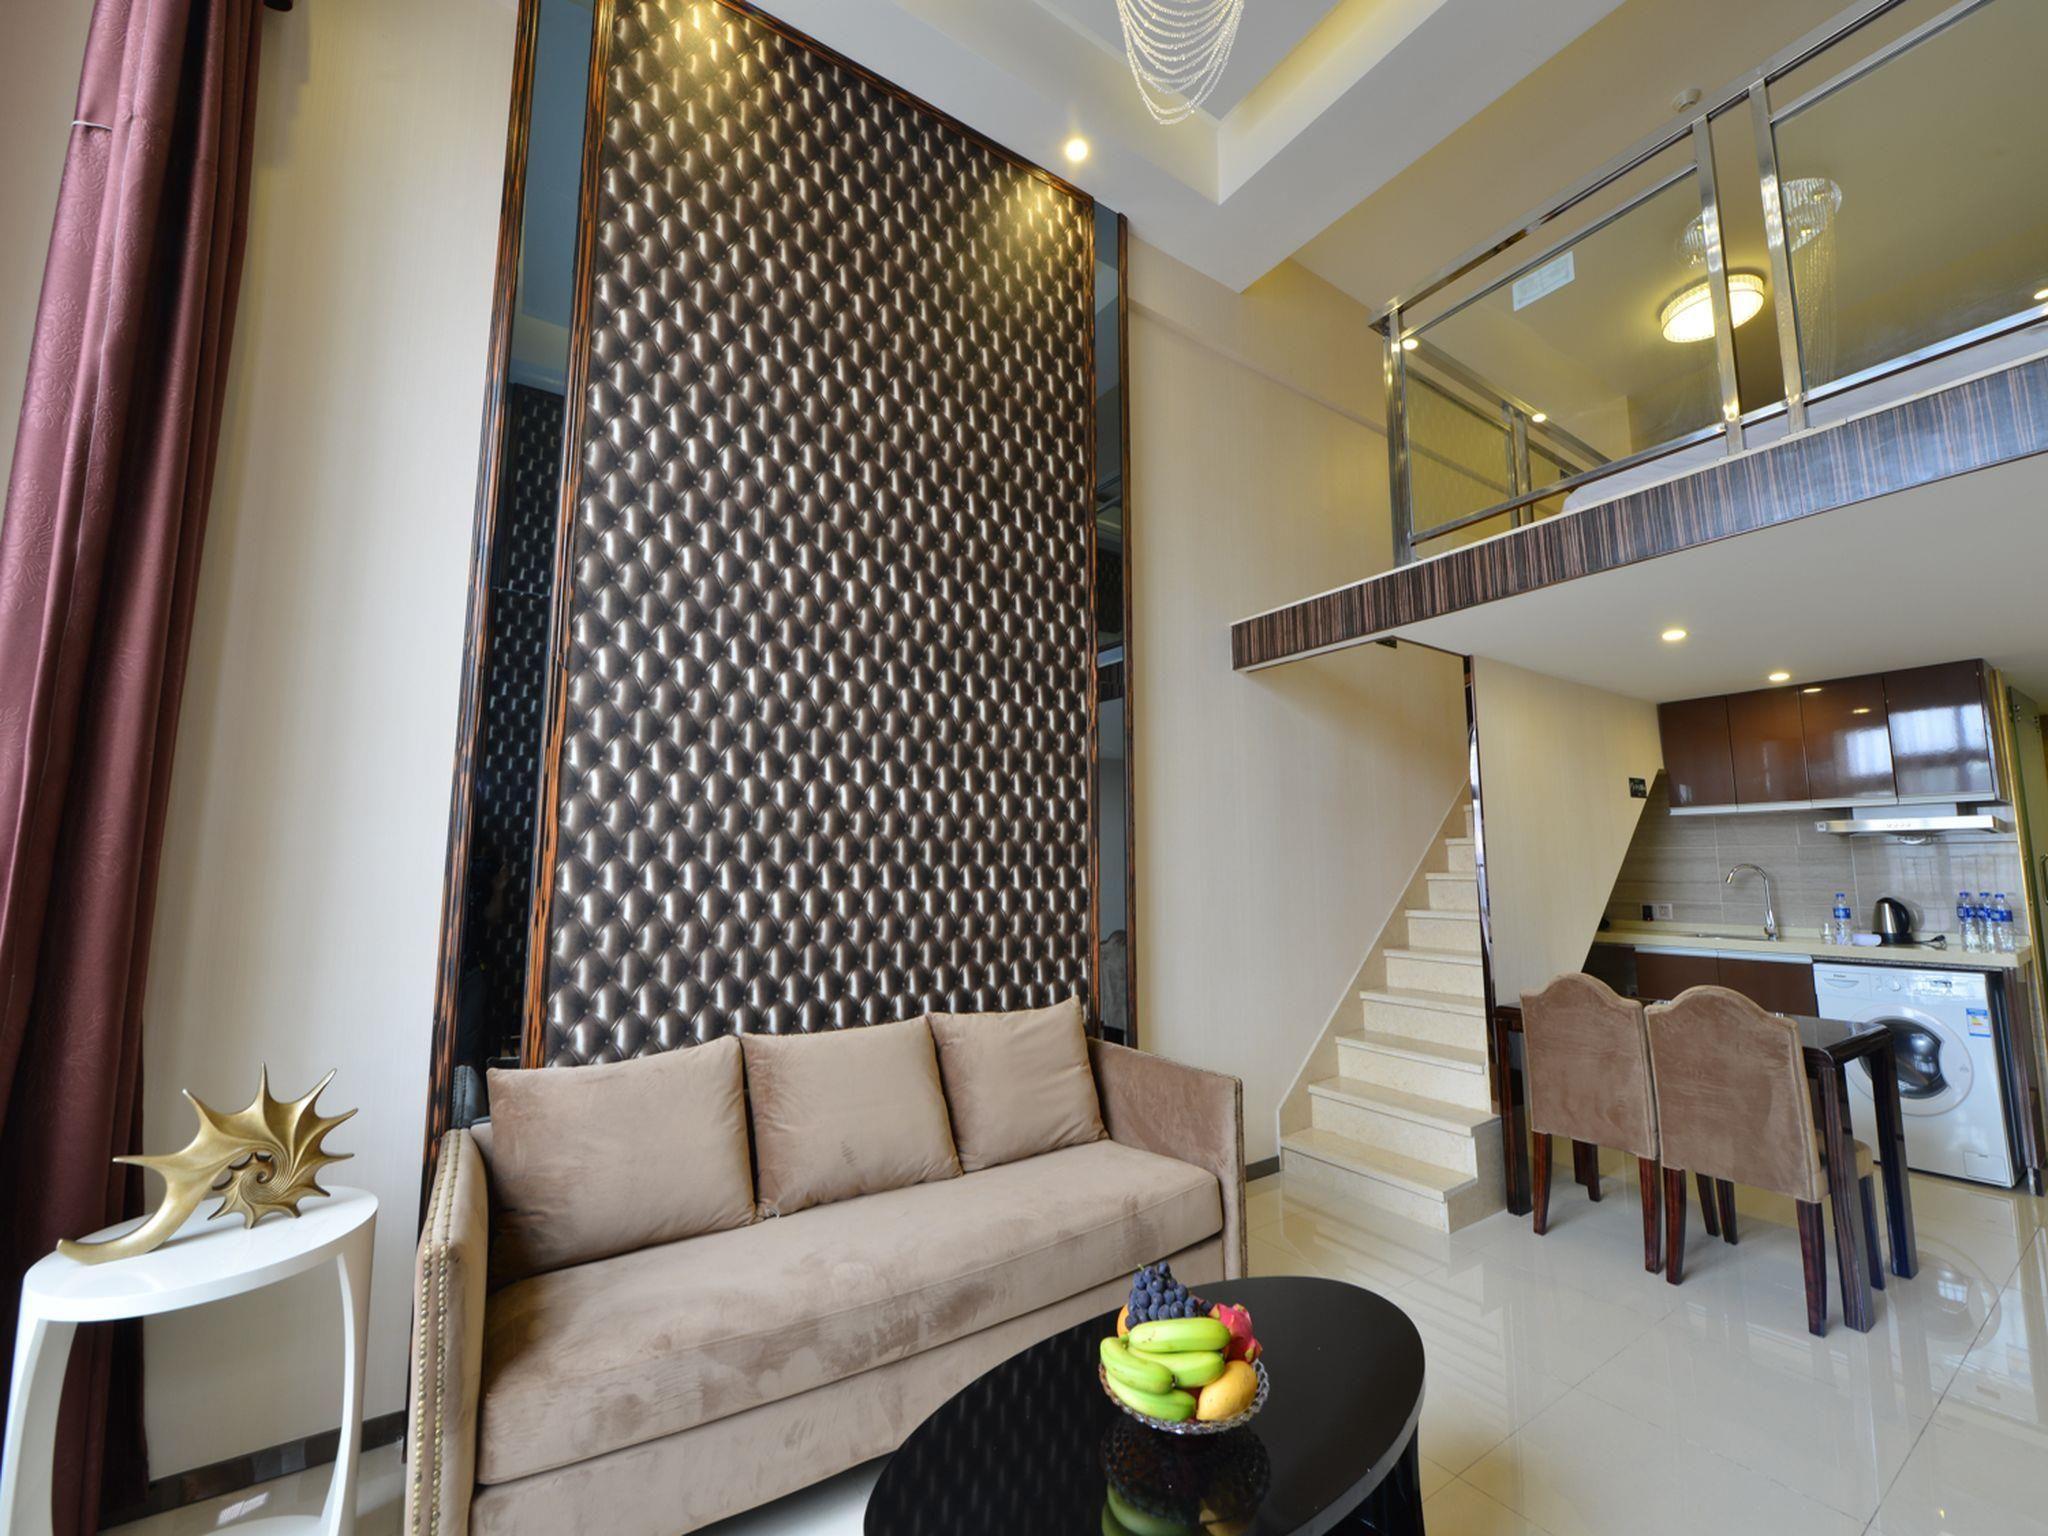 Aden Home Smart Service Apartment Guangzhou, China